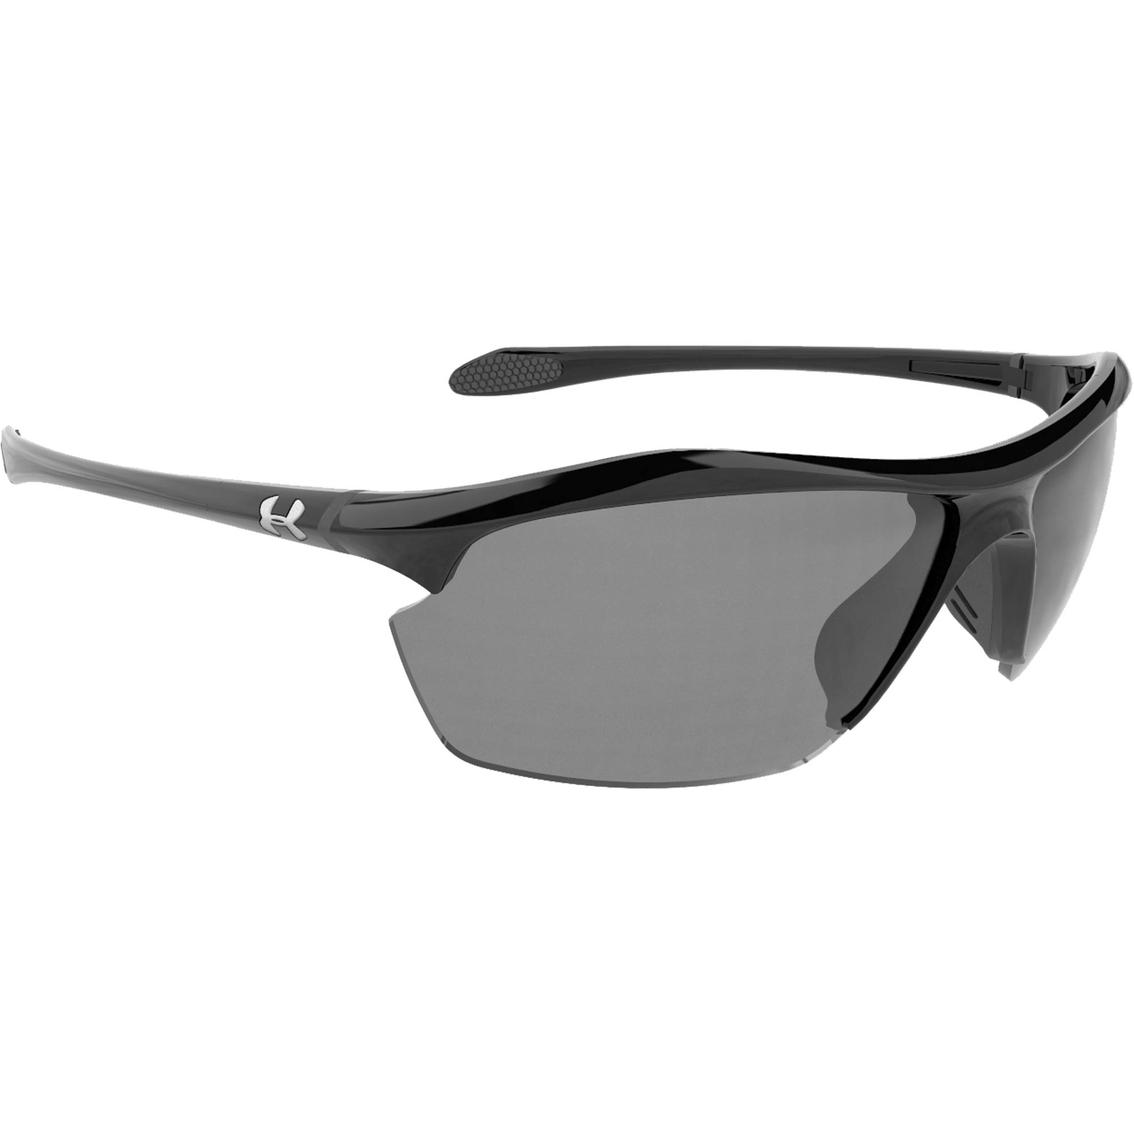 45048ed821 Under Armour Zone Xl Polarized Multiflection Lens Sunglasses